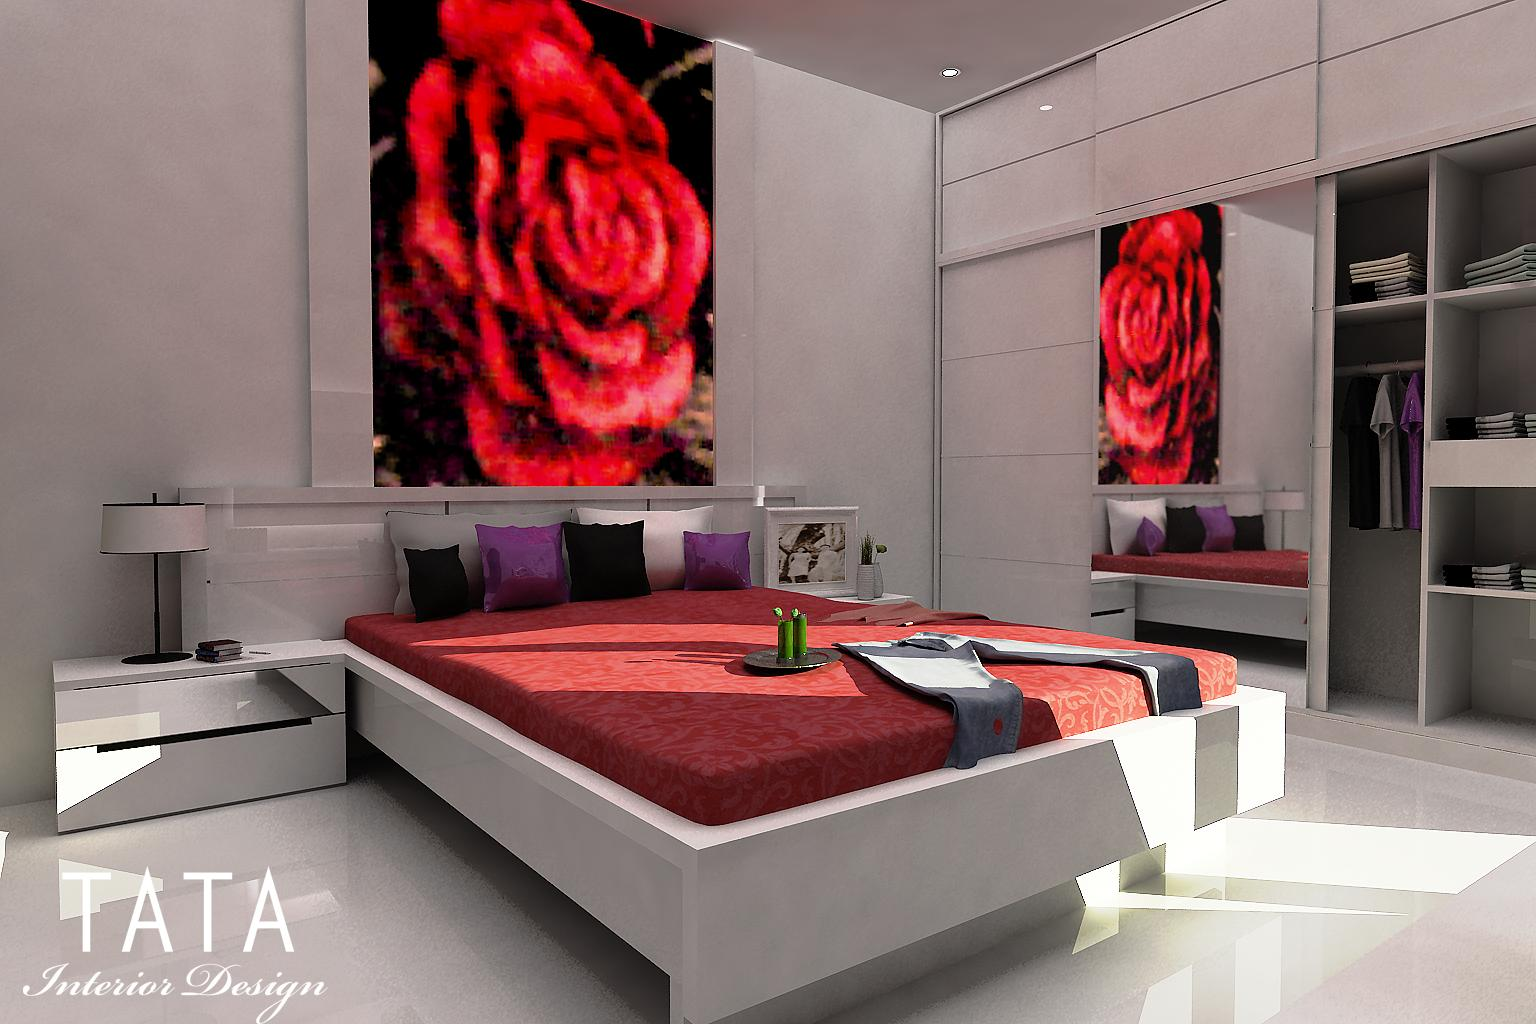 desain interior kamar tidur minimalis tata interior desain